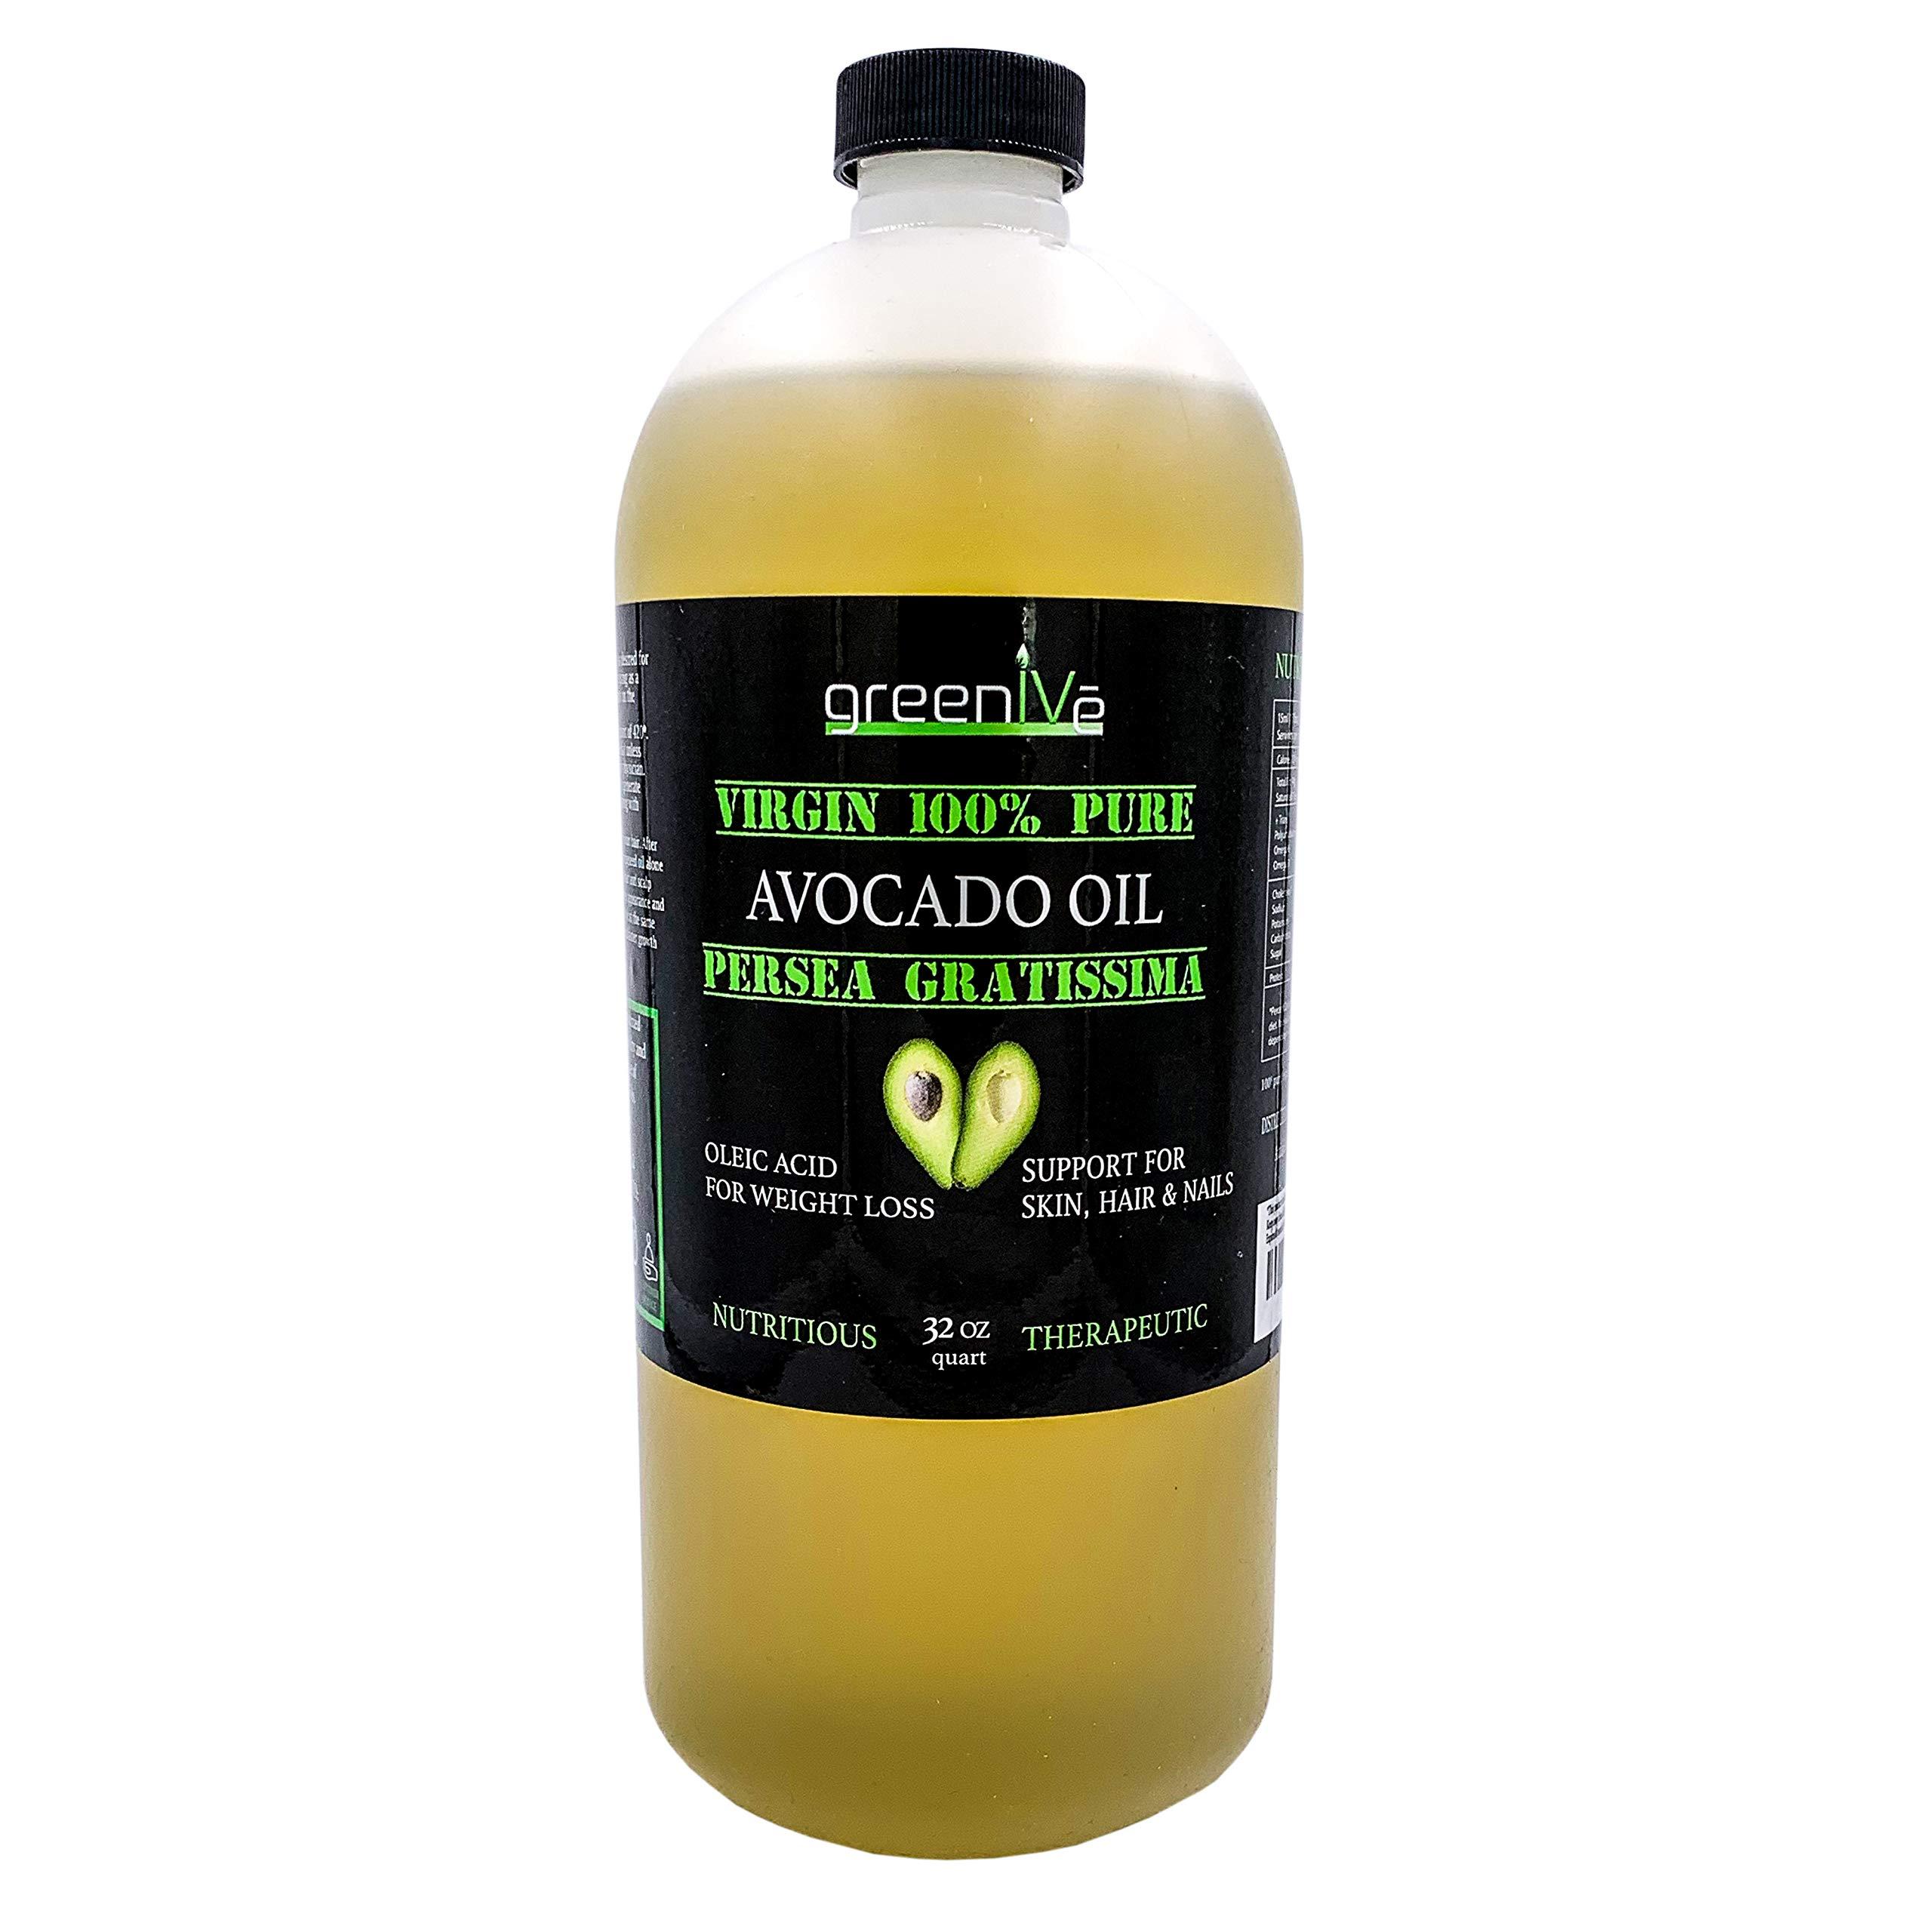 GreenIVe - Avocado Oil - 100% Pure Avocado Oil - Cold Pressed - Virgin - Exclusively on Amazon (32 Ounce) by Greenive